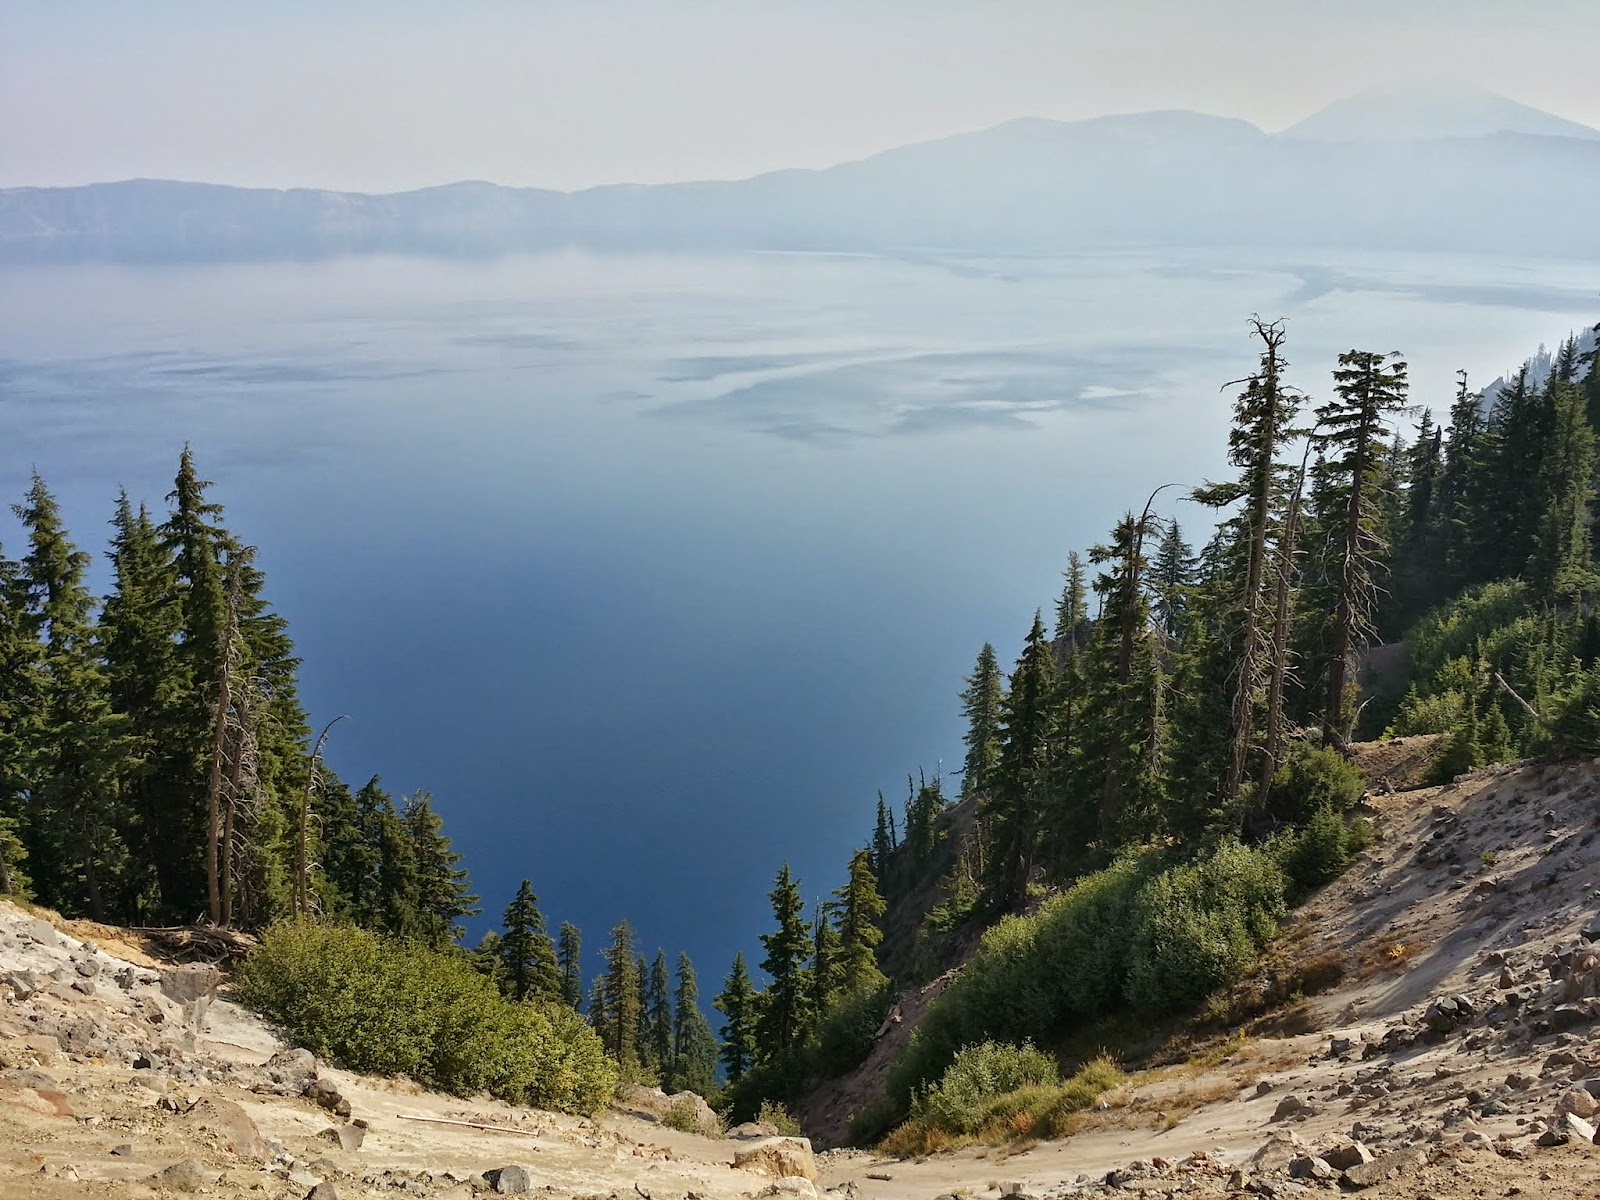 view of Crater Lake at Rim Village